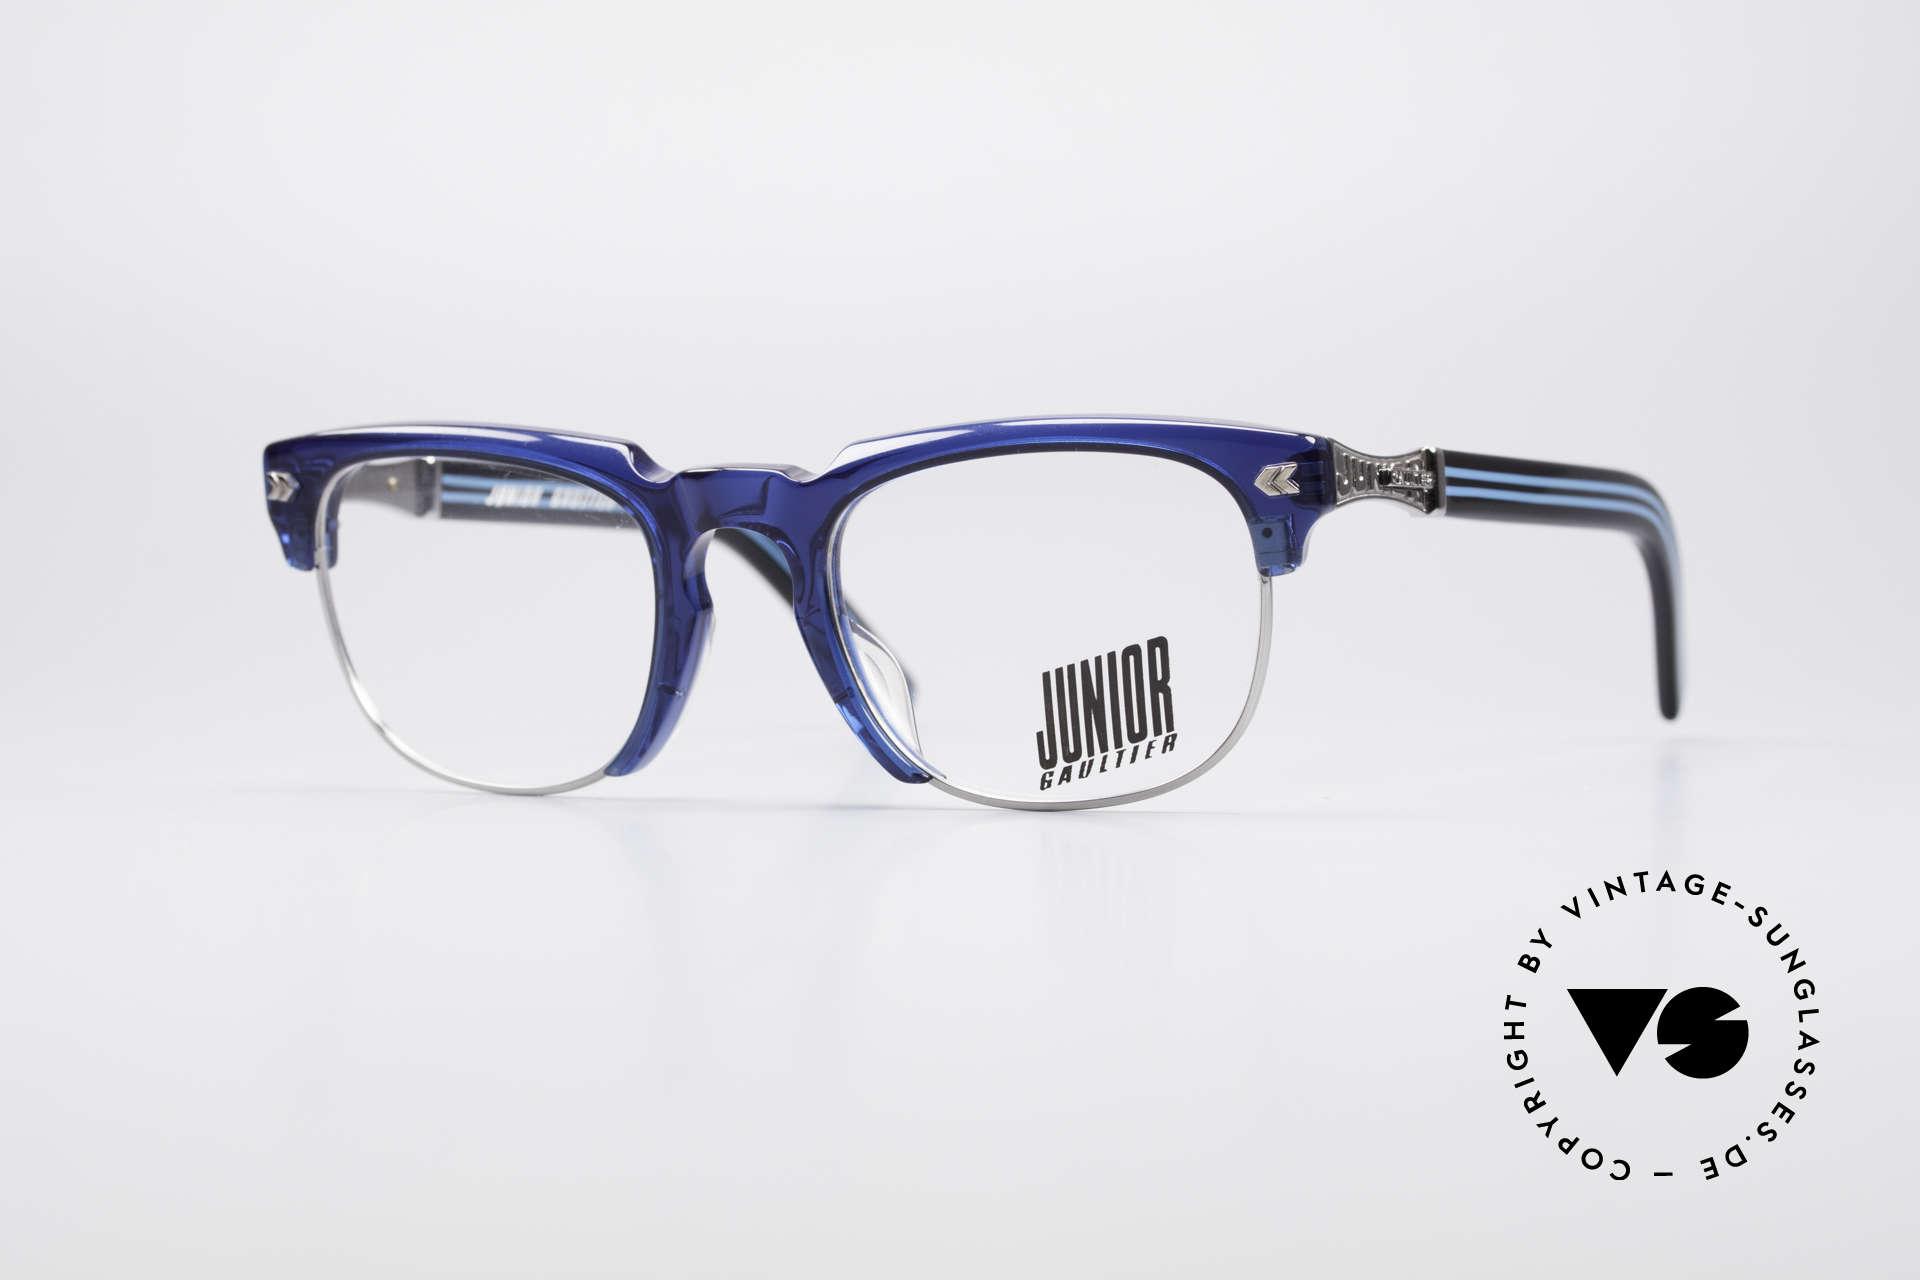 Jean Paul Gaultier 57-1271 90's Junior Collection, spectacular Jean Paul GAULTIER 90's designer glasses, Made for Men